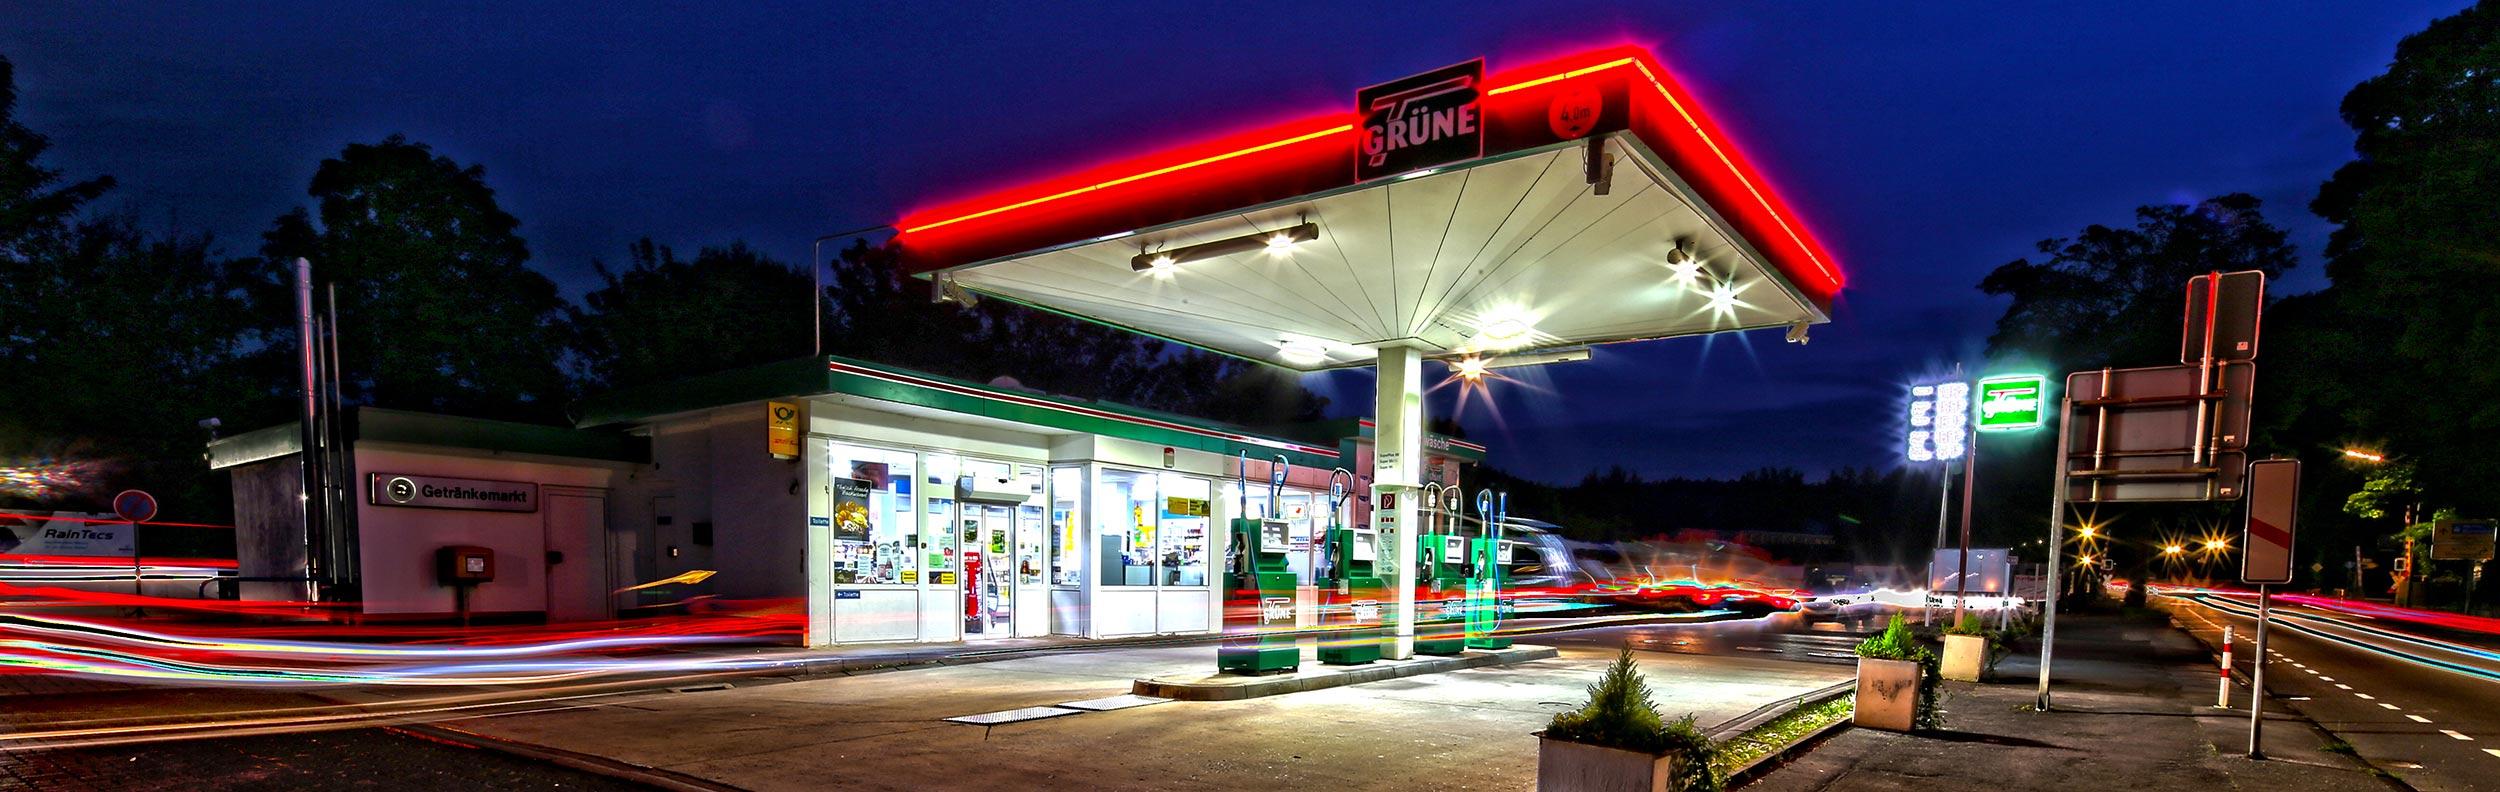 gruene-tankstellen-sauerland-001